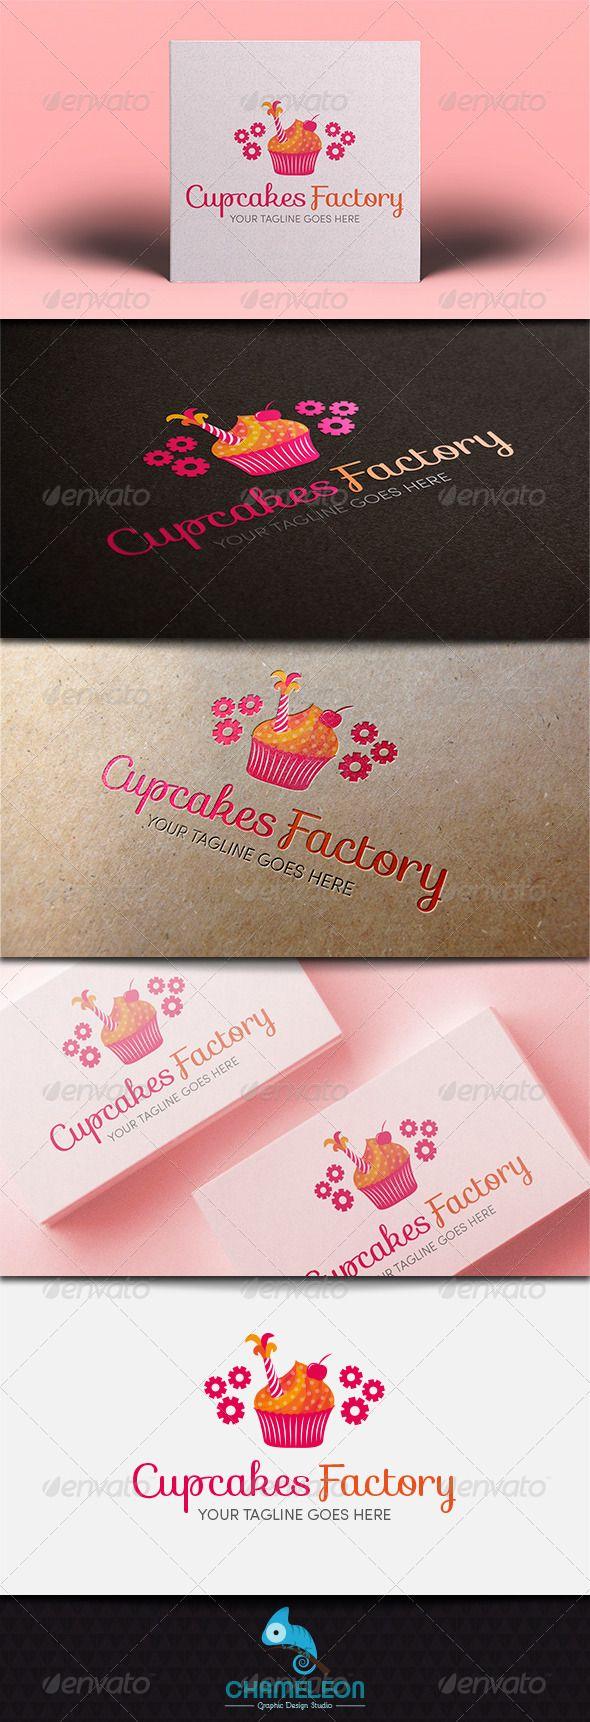 Cupcakes Factory - Logo Template